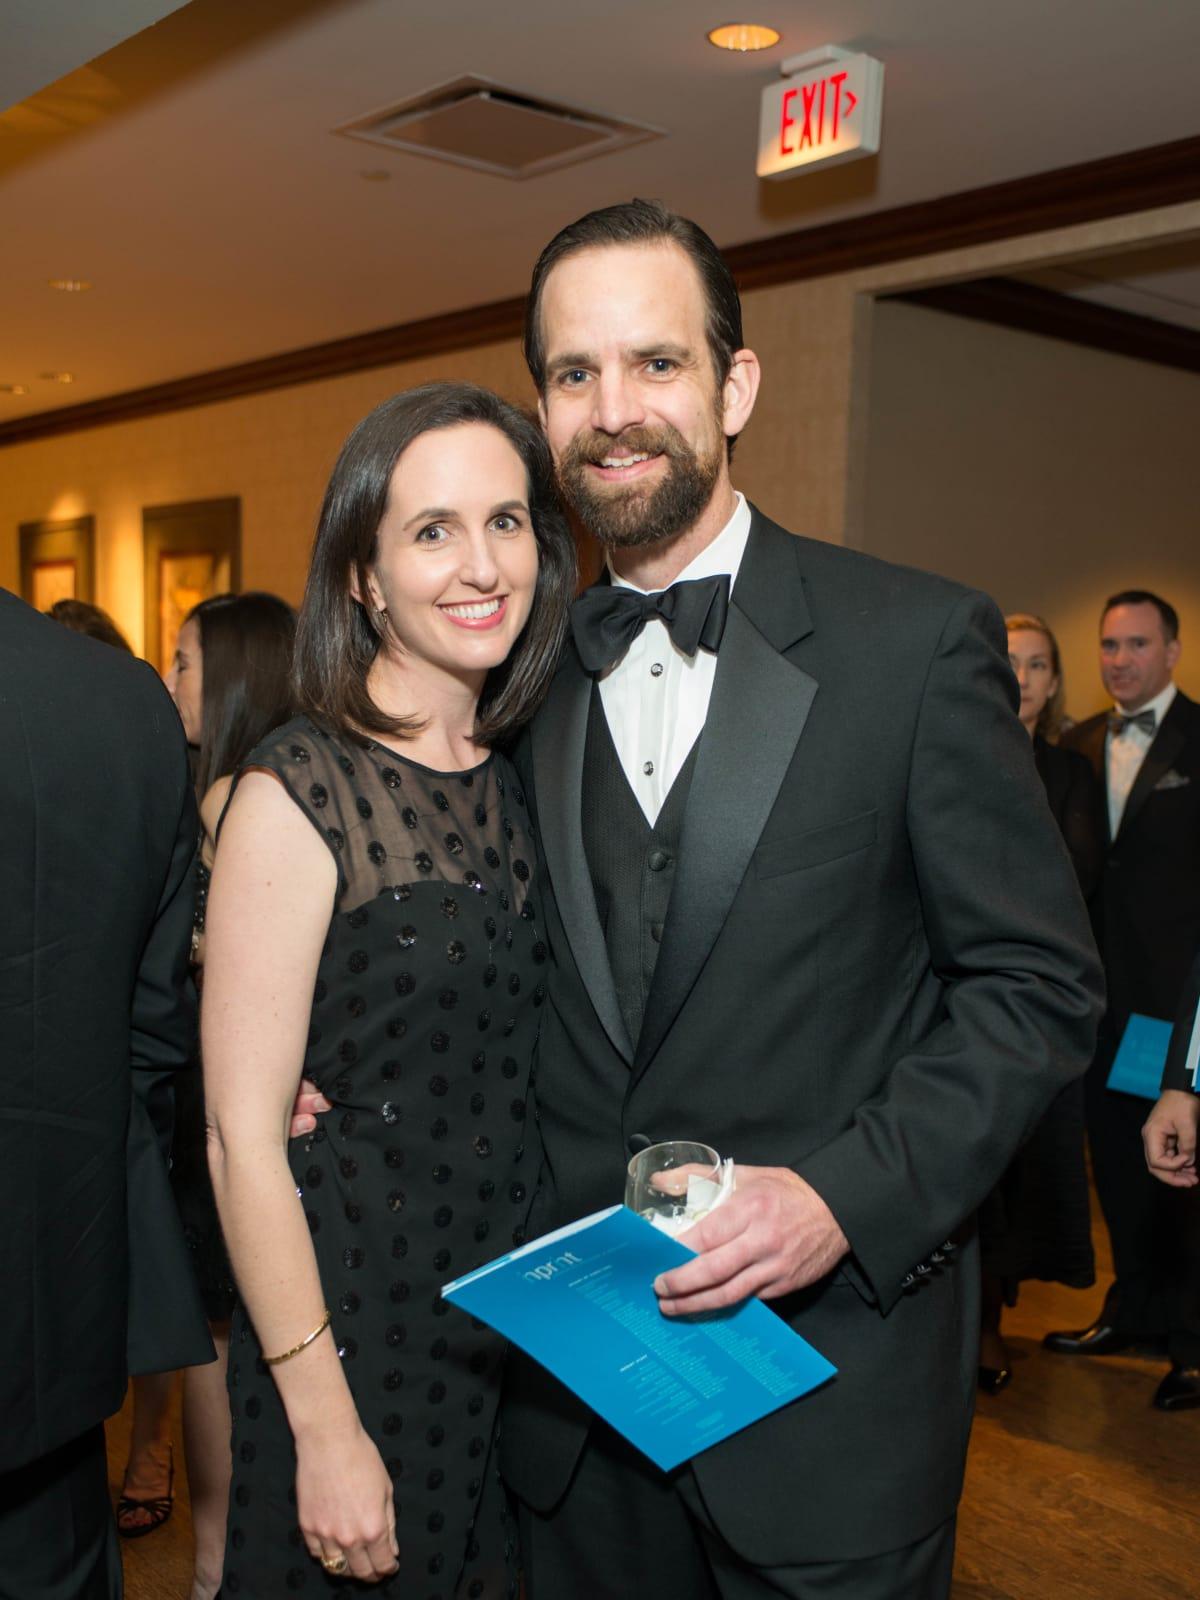 Mary S. Dawson and Jack Dawson at Inprint Gala